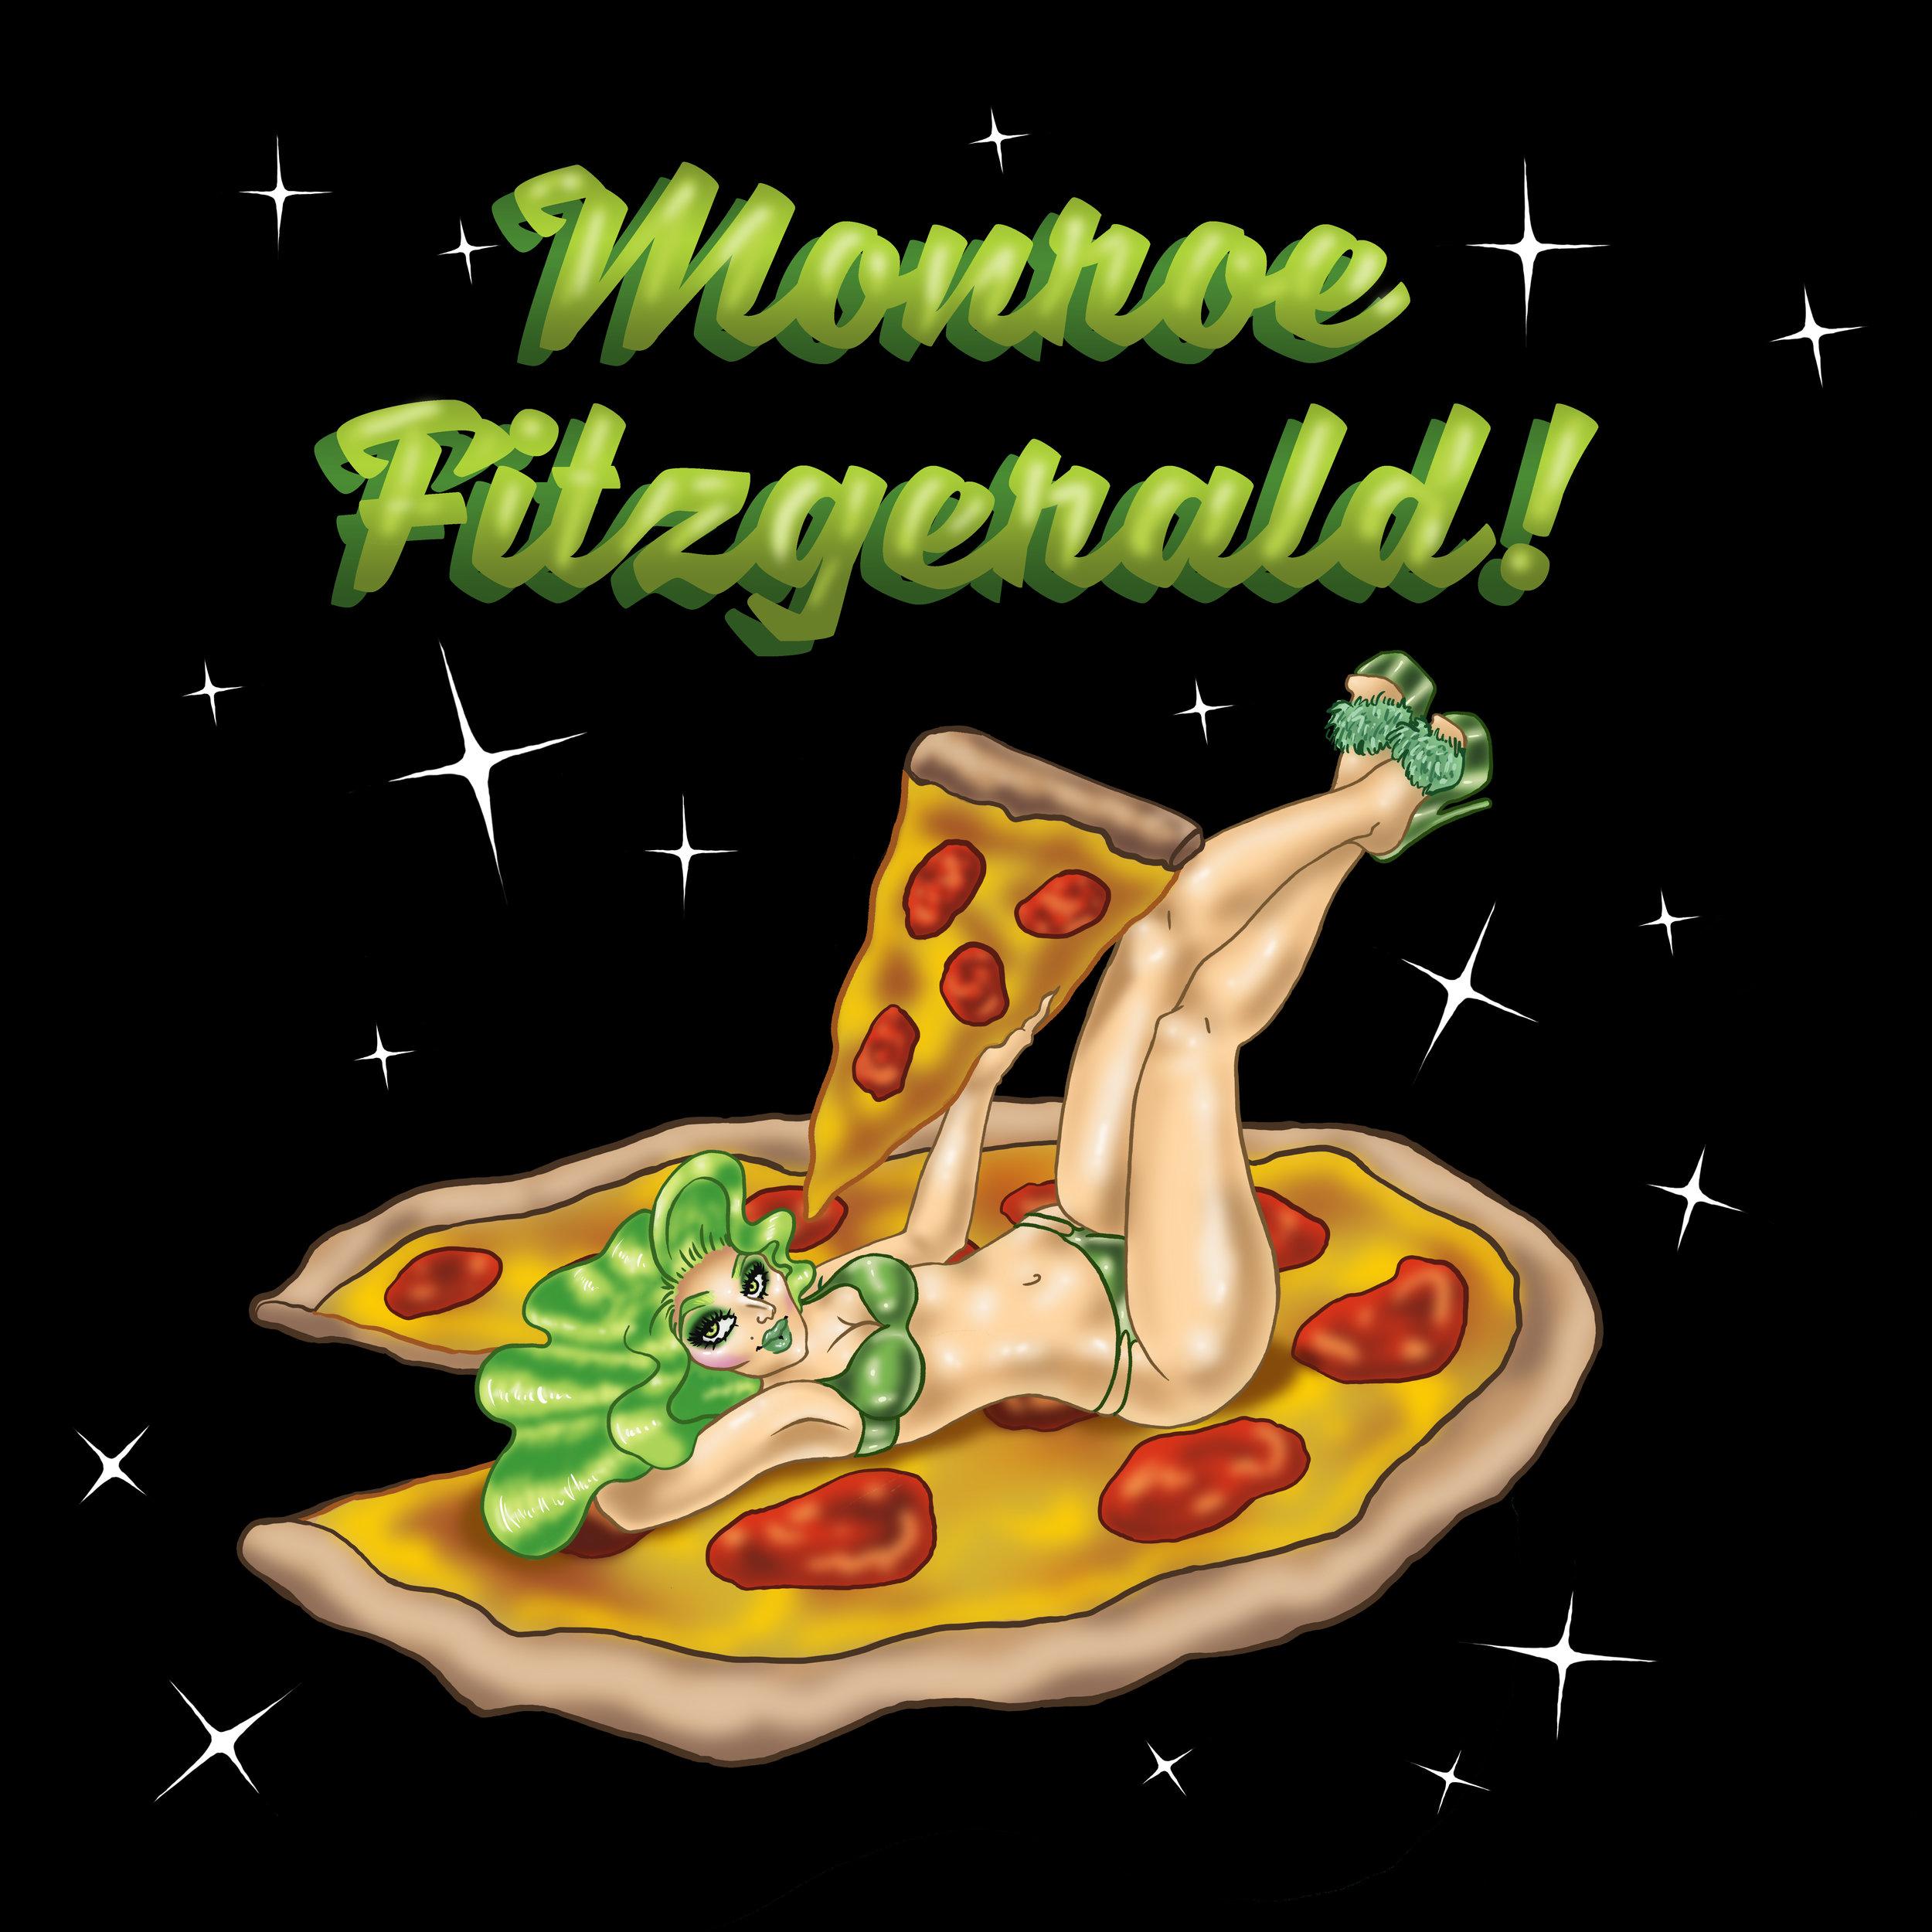 Monroe Fitzgerald!